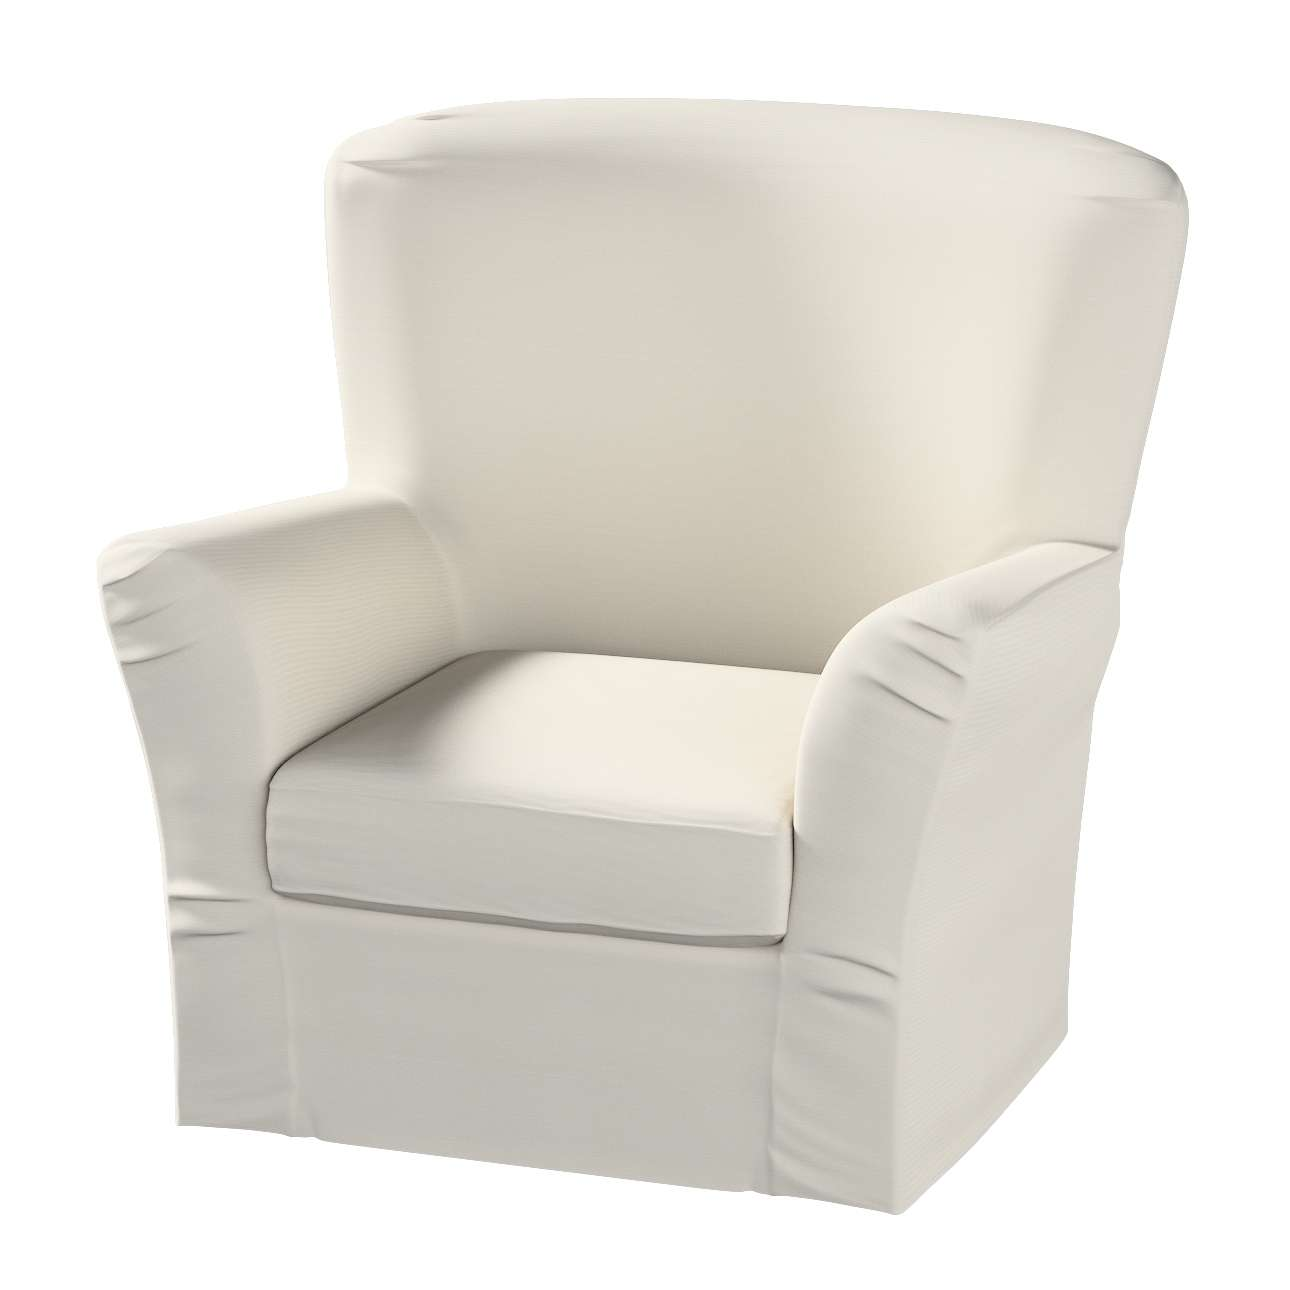 TOMELILLA fotelio užvalkalas TOMELILLA fotelis kolekcijoje Cotton Panama, audinys: 702-31